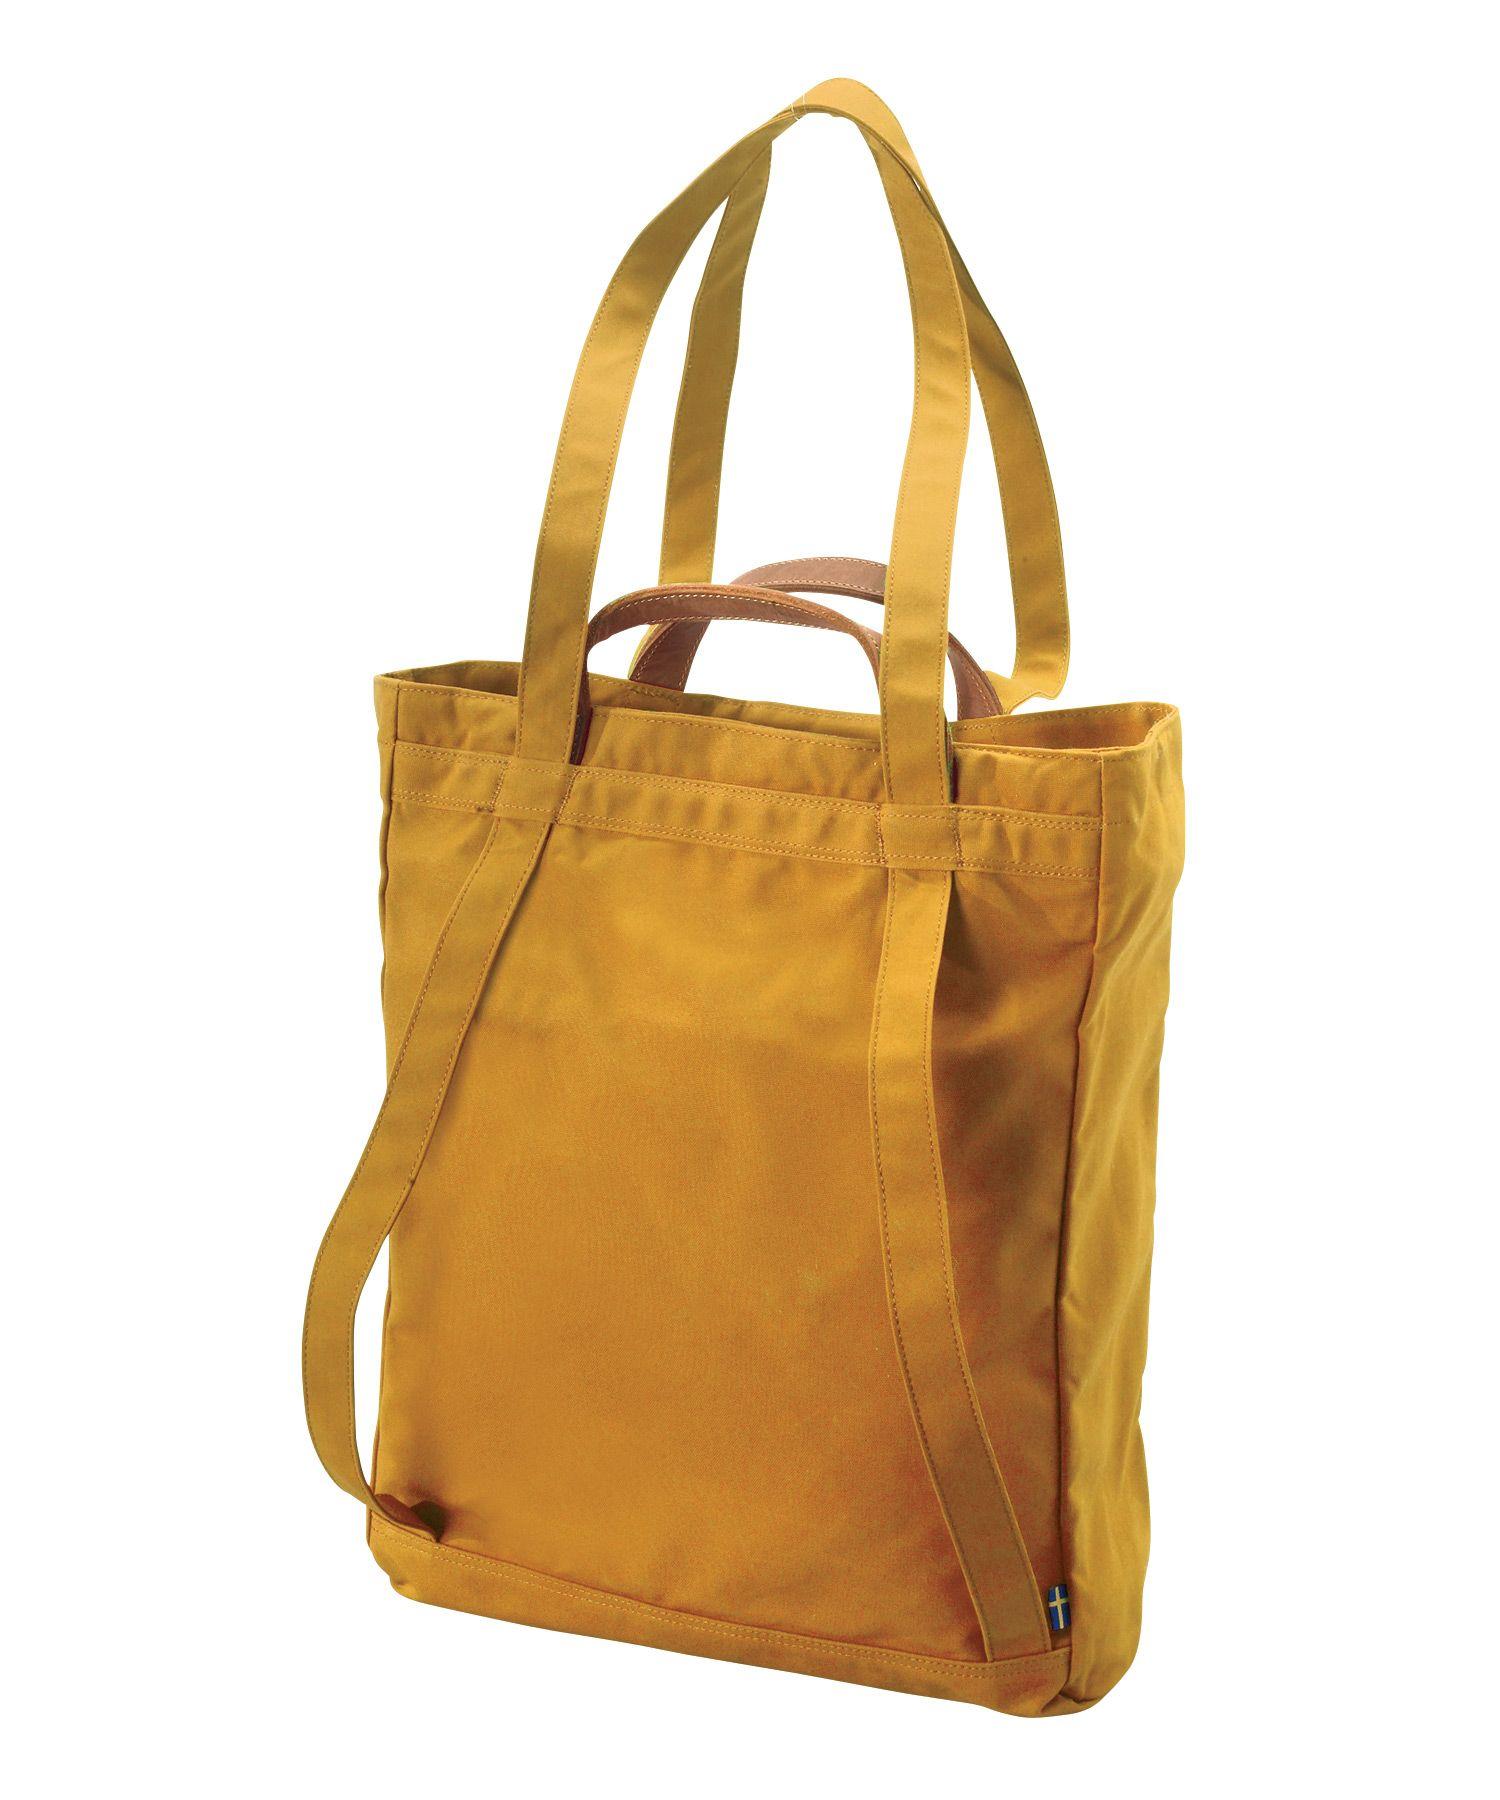 Tote Bag - Walnuts 1 by VIDA VIDA 9vFXSl